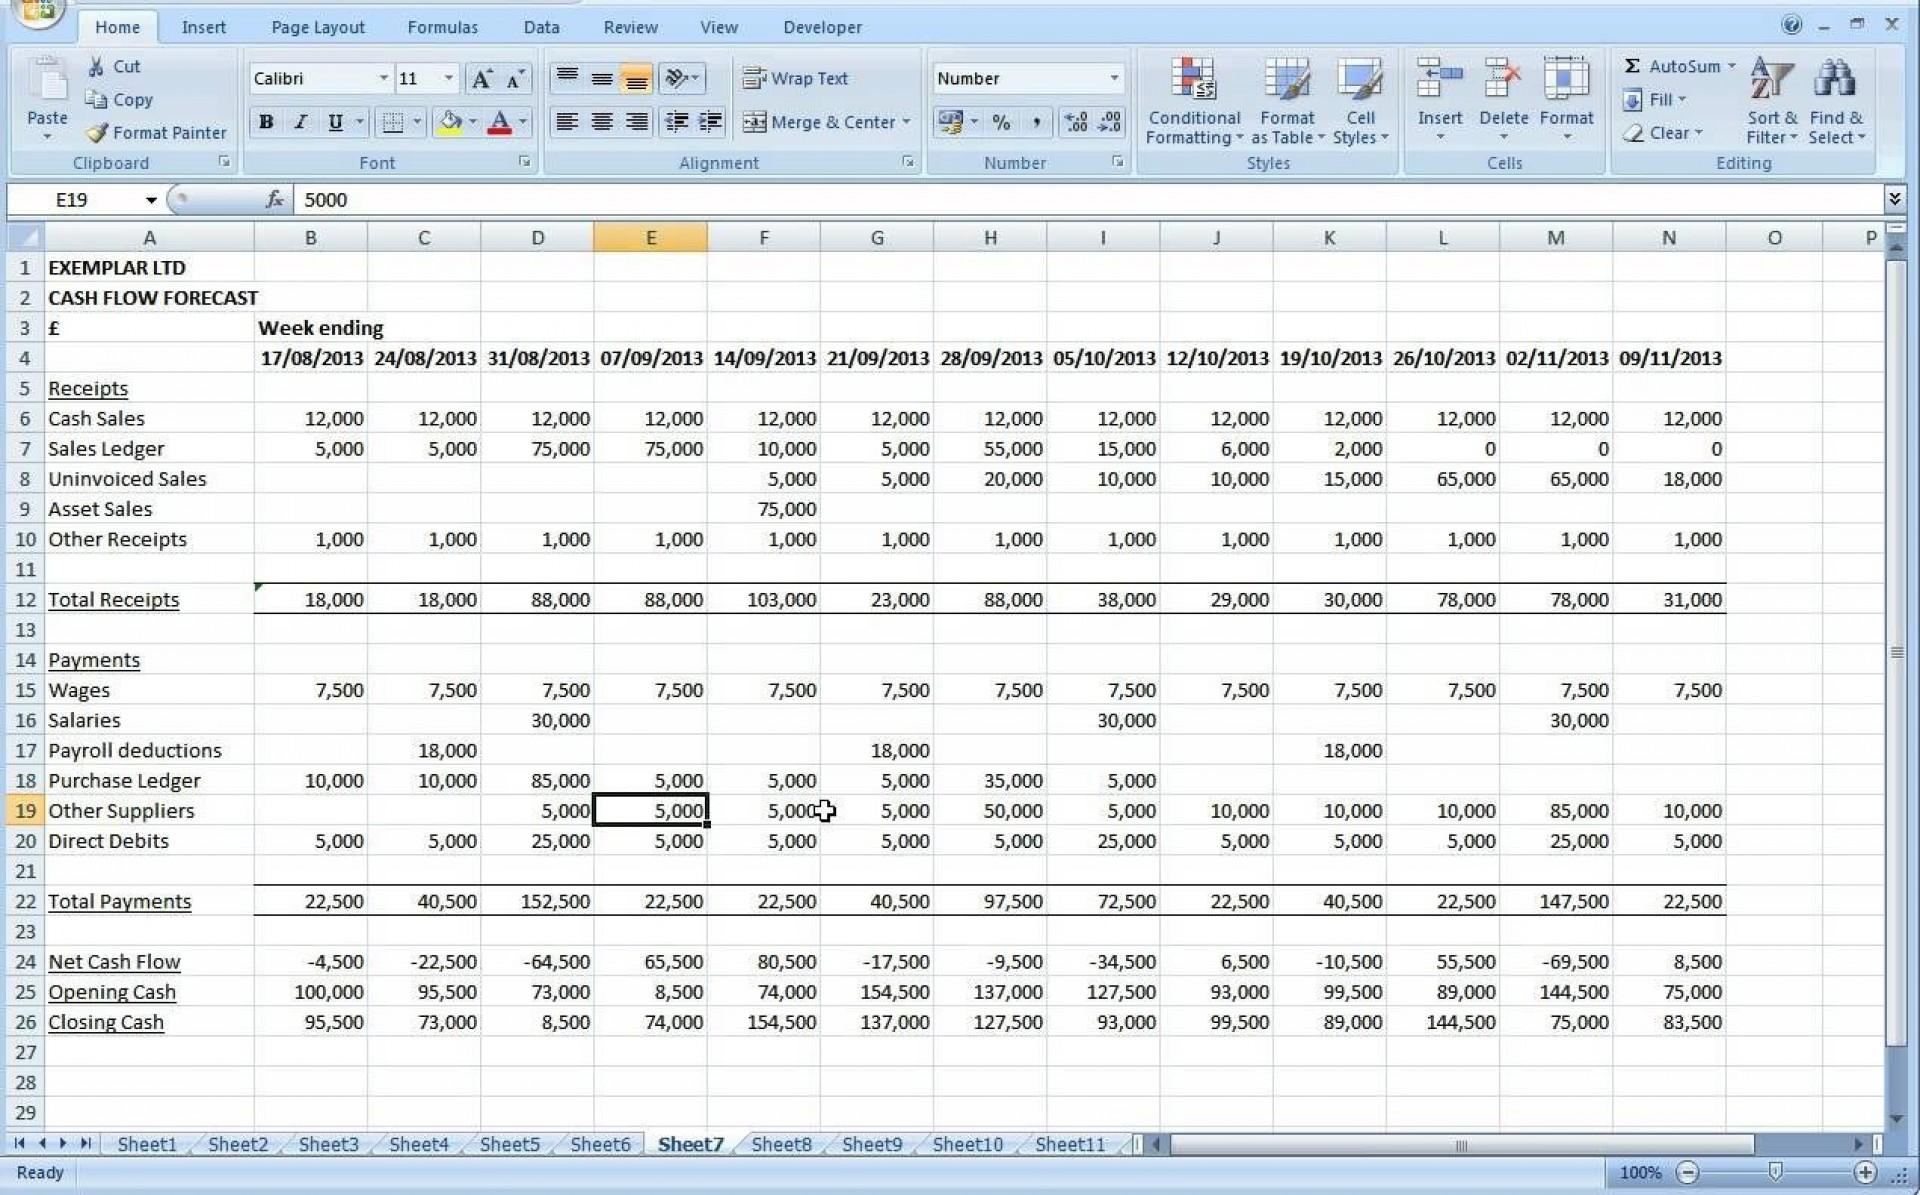 002 Unusual Cash Flow Forecast Excel Template Uk Free Design 1920